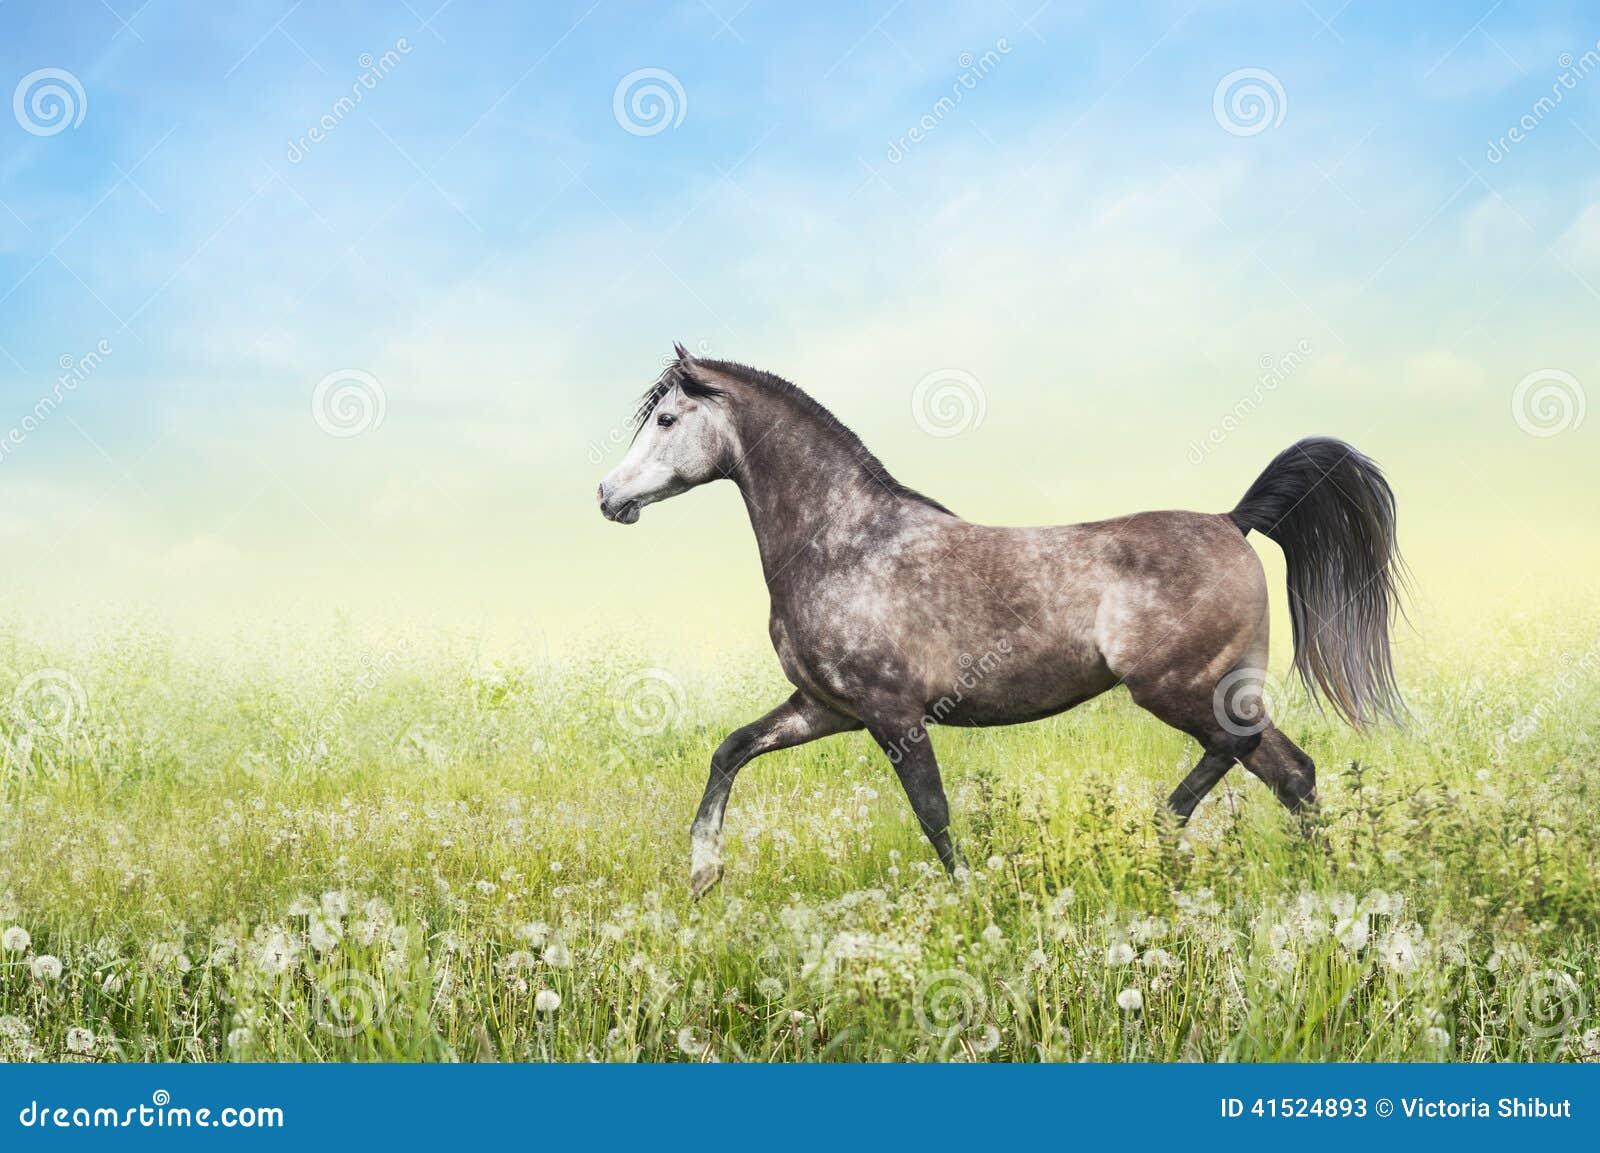 Horse running trot on summer pasture